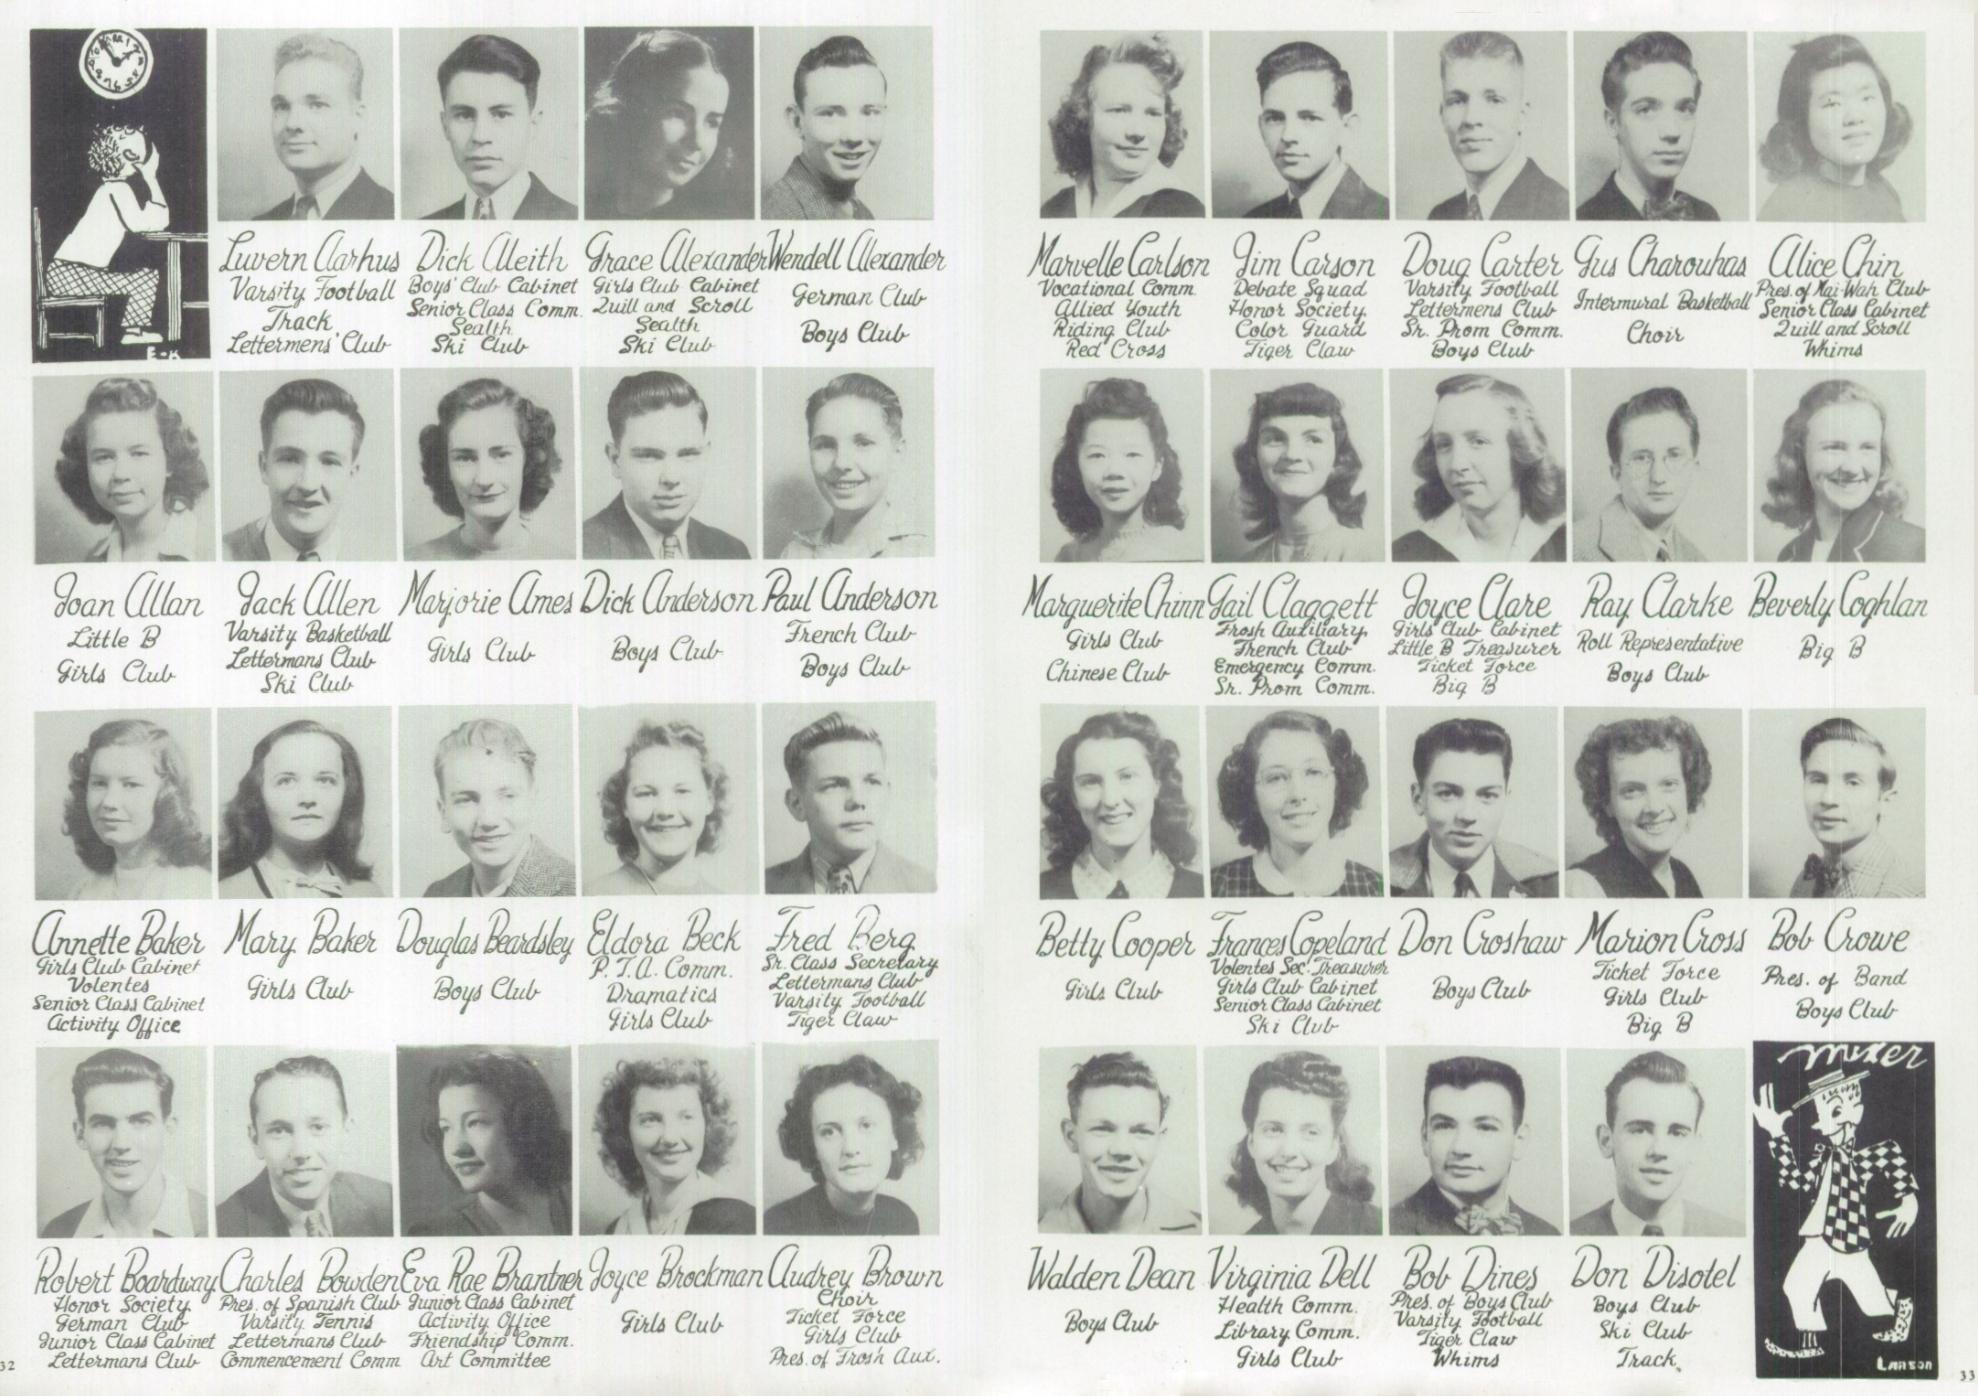 1946 Broadway High School Yearbook - Senior Portraits - 1